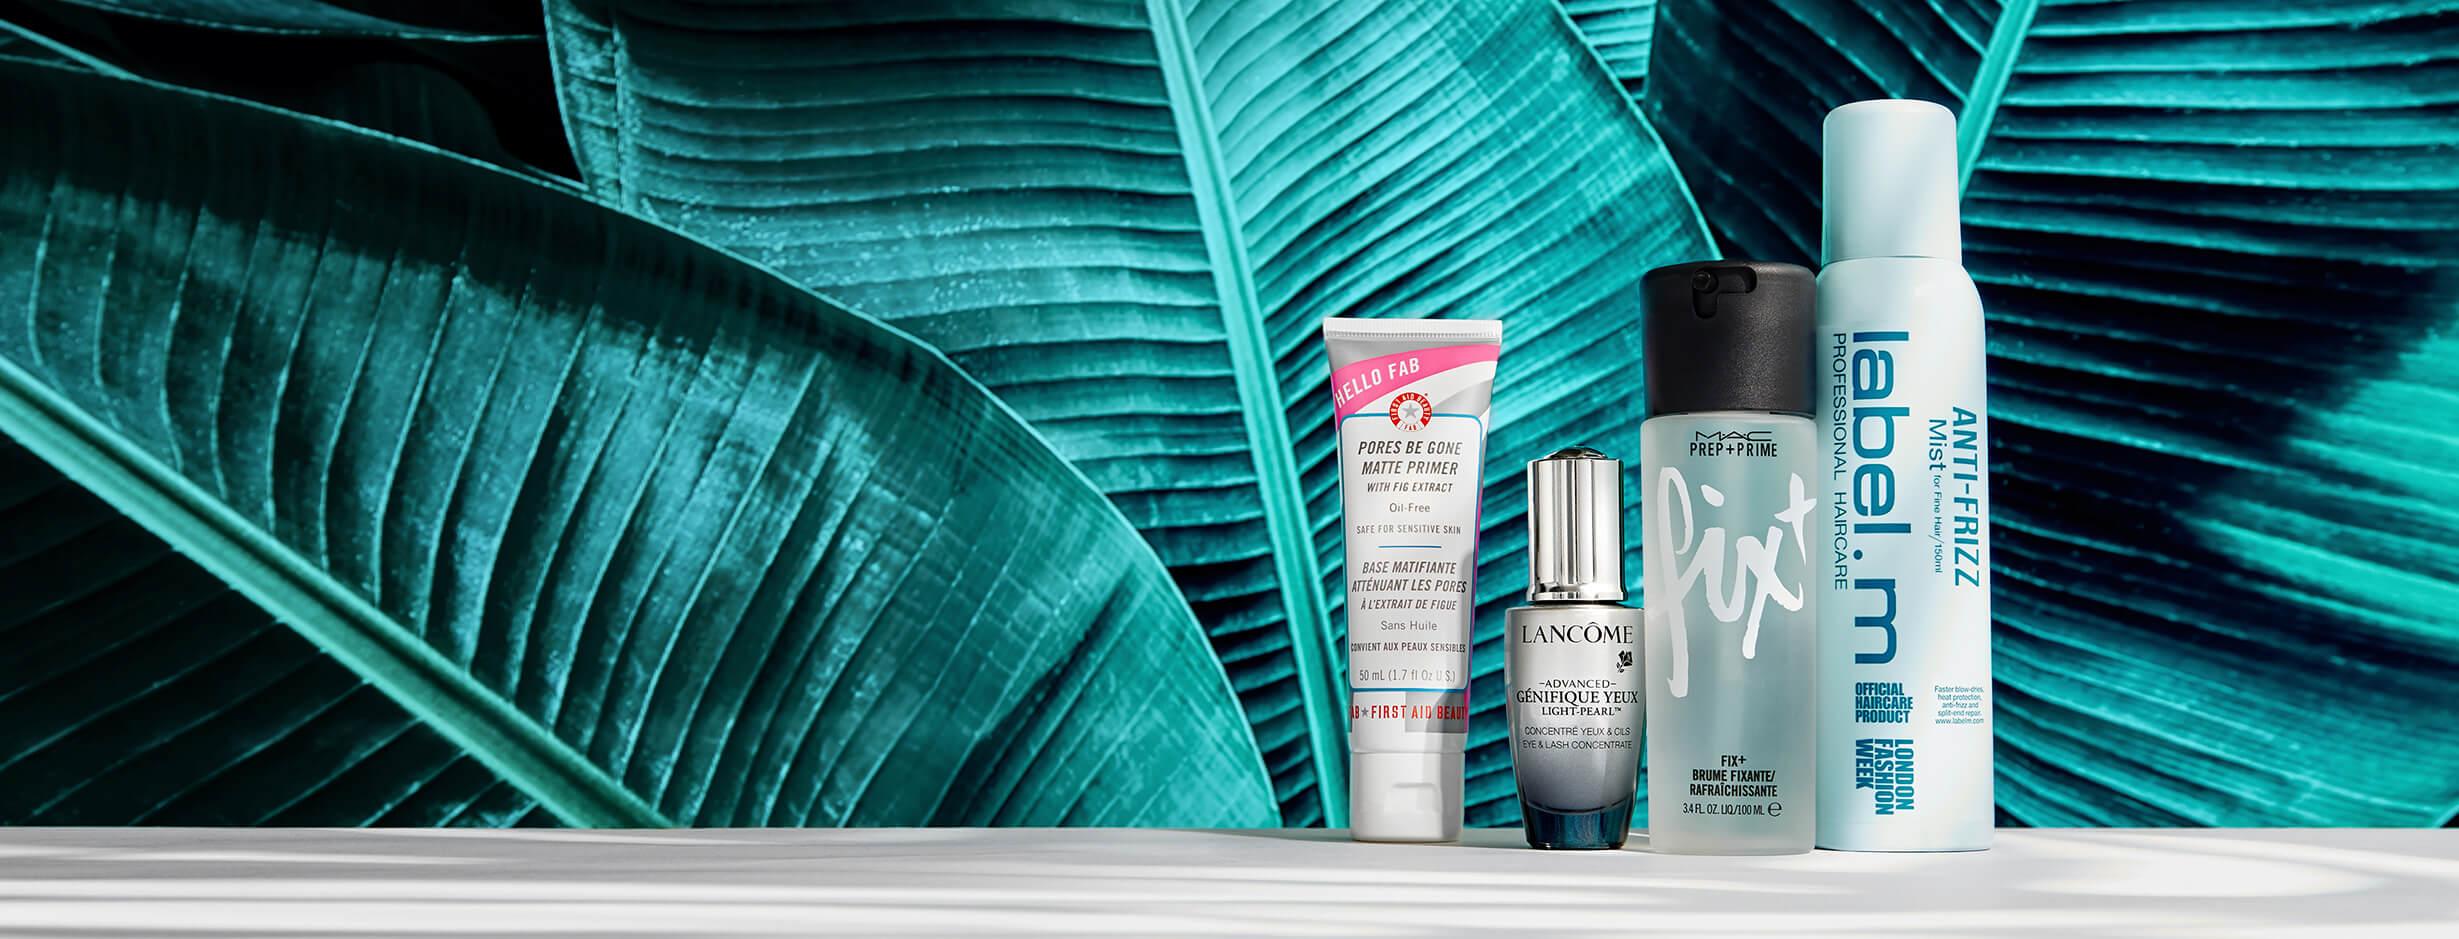 Lookfantastic | Luxury Beauty | Premium Skincare | Leading Haircare